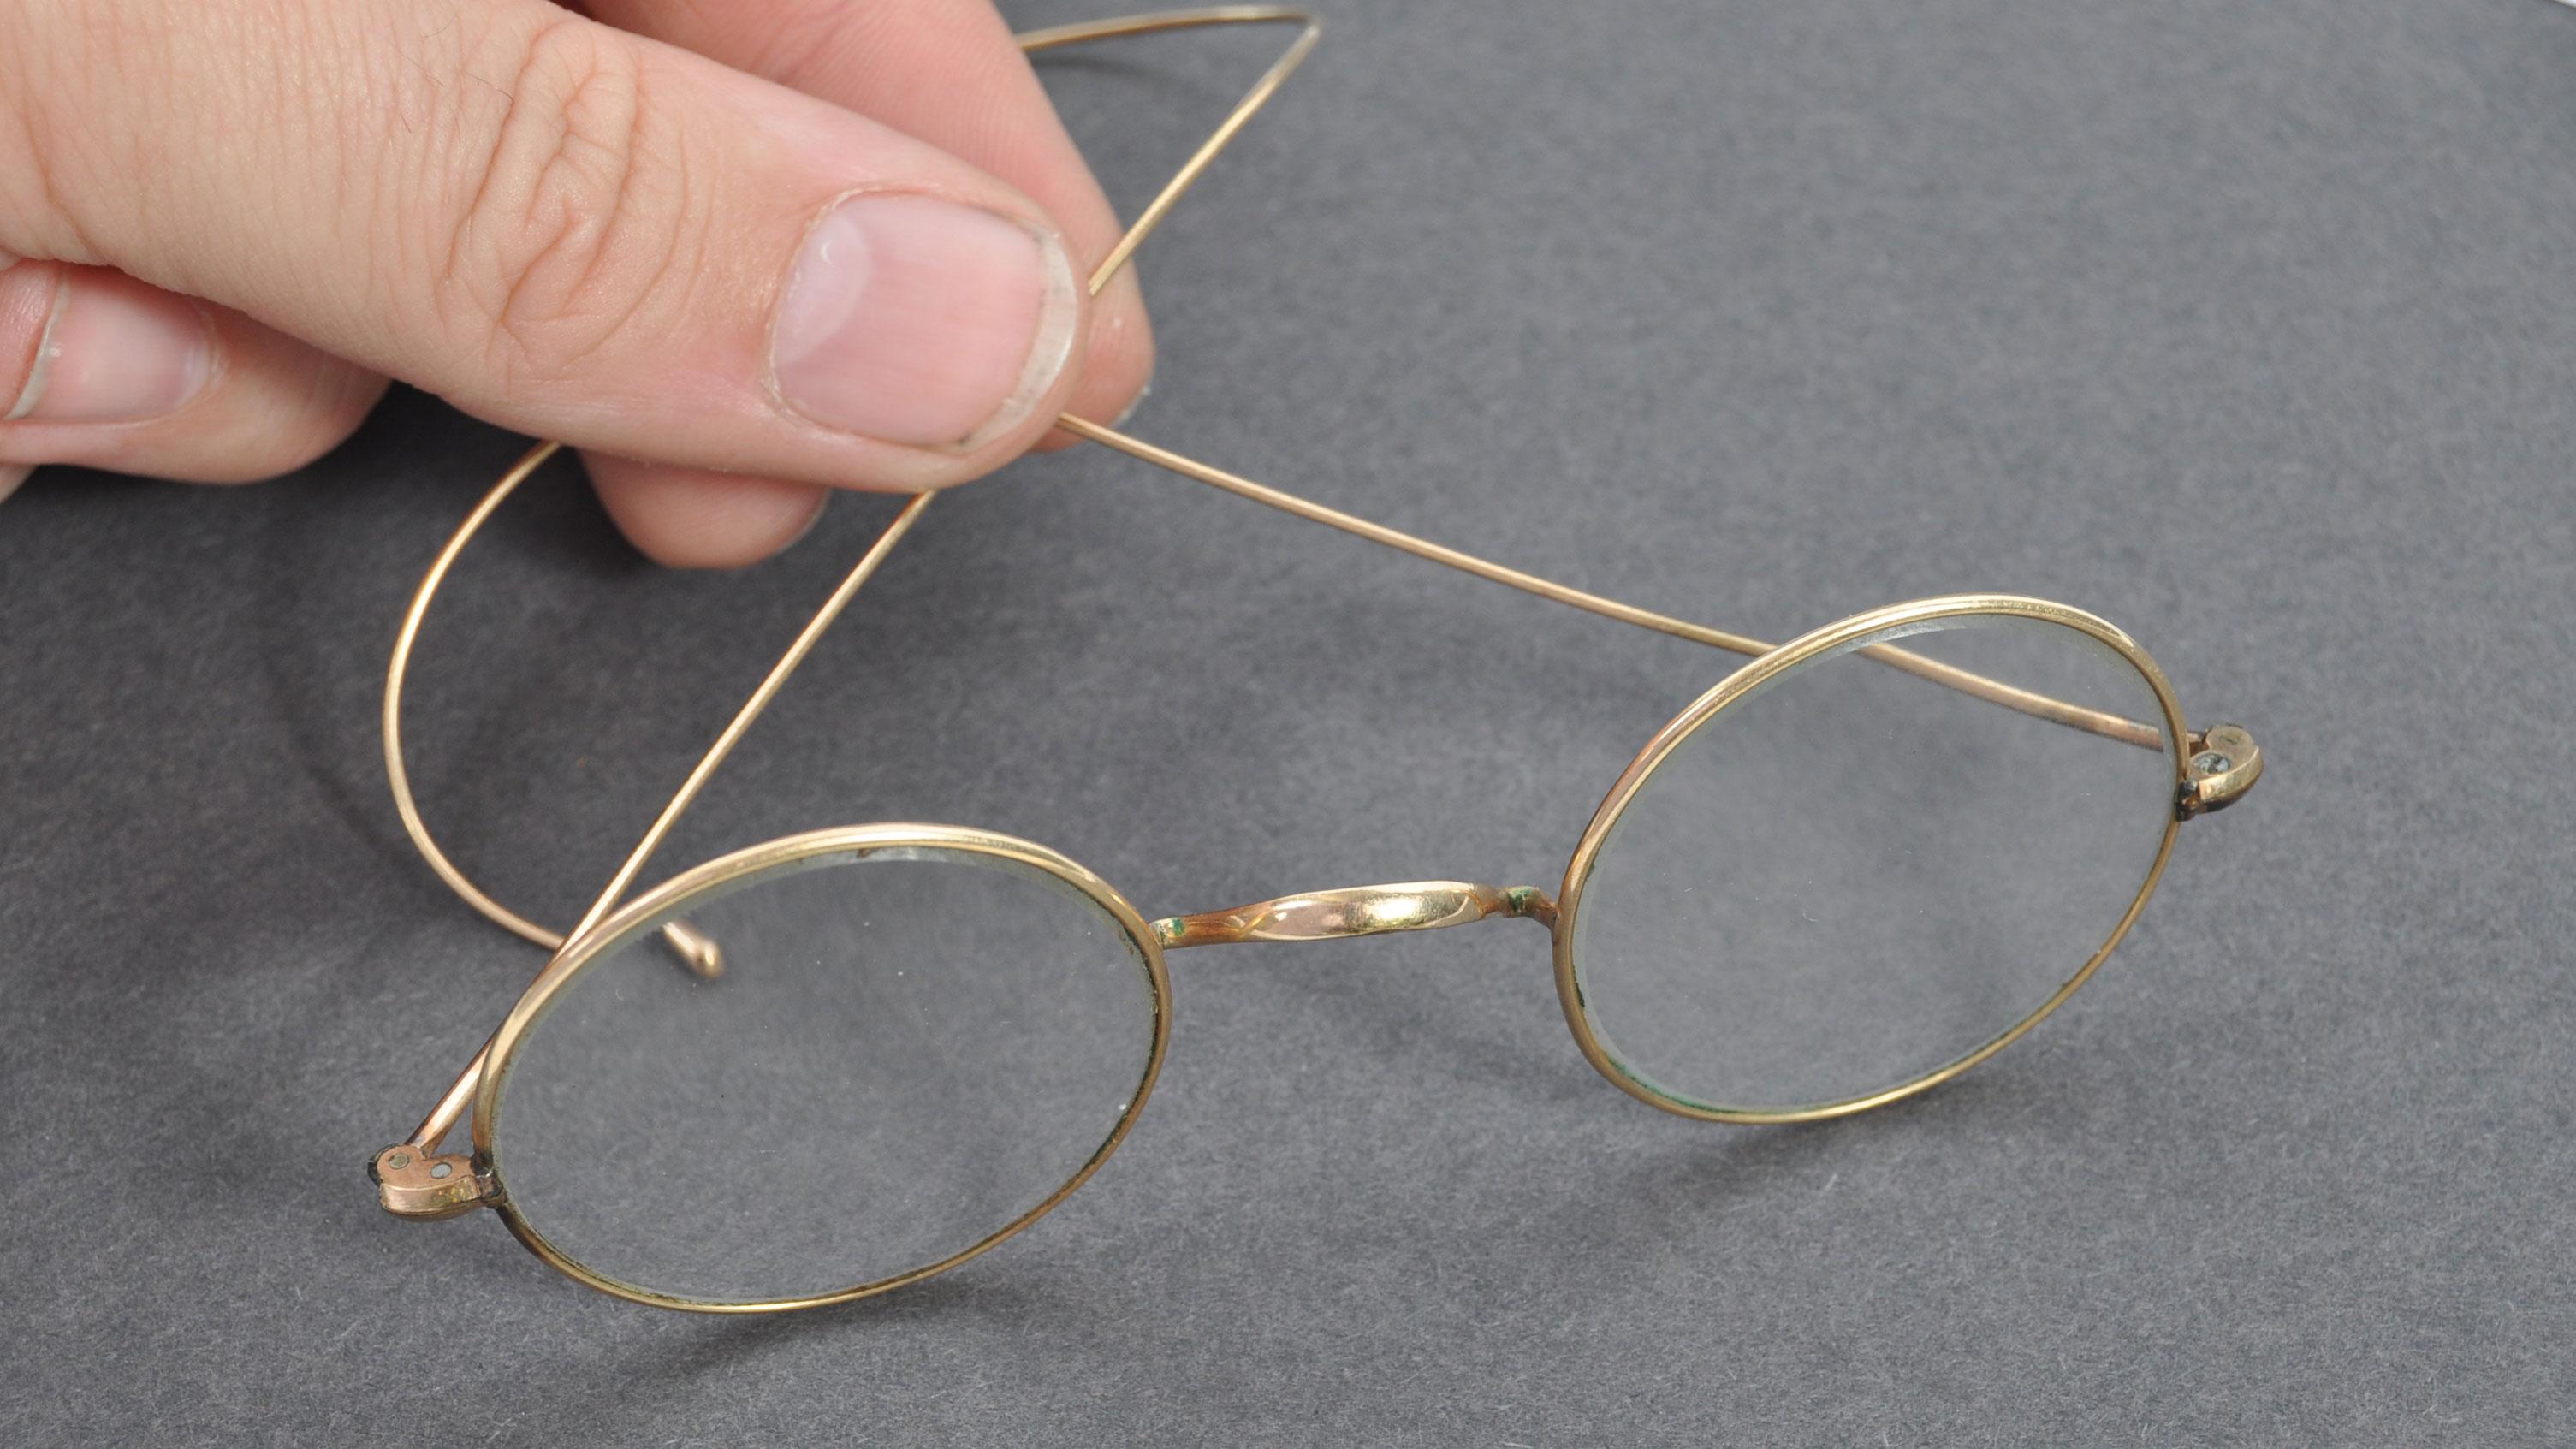 Gandhi's glasses sell at auction for $340K, smashing estimates